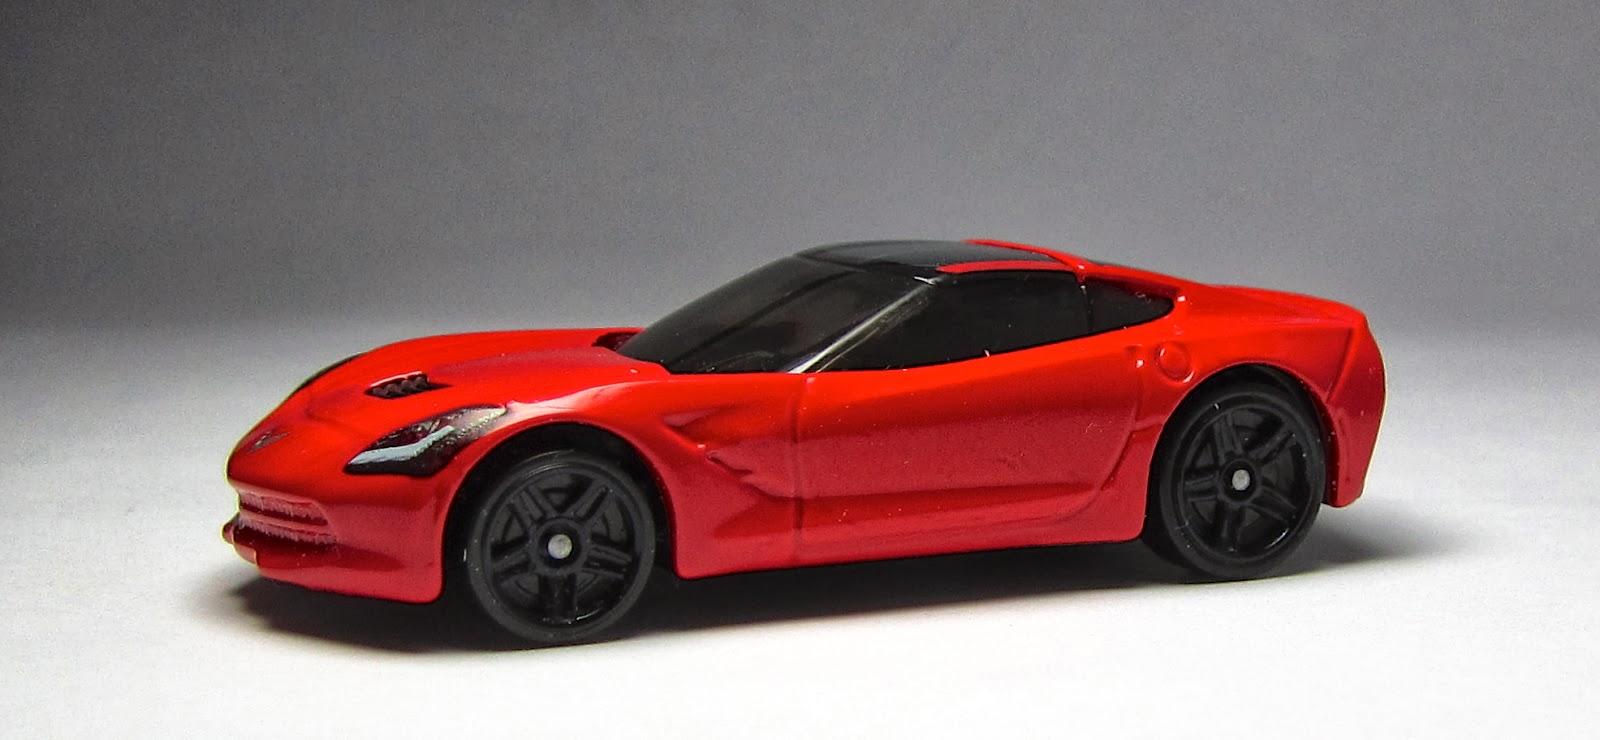 Hot Wheels 2014 Corvette Toy | Autos Weblog